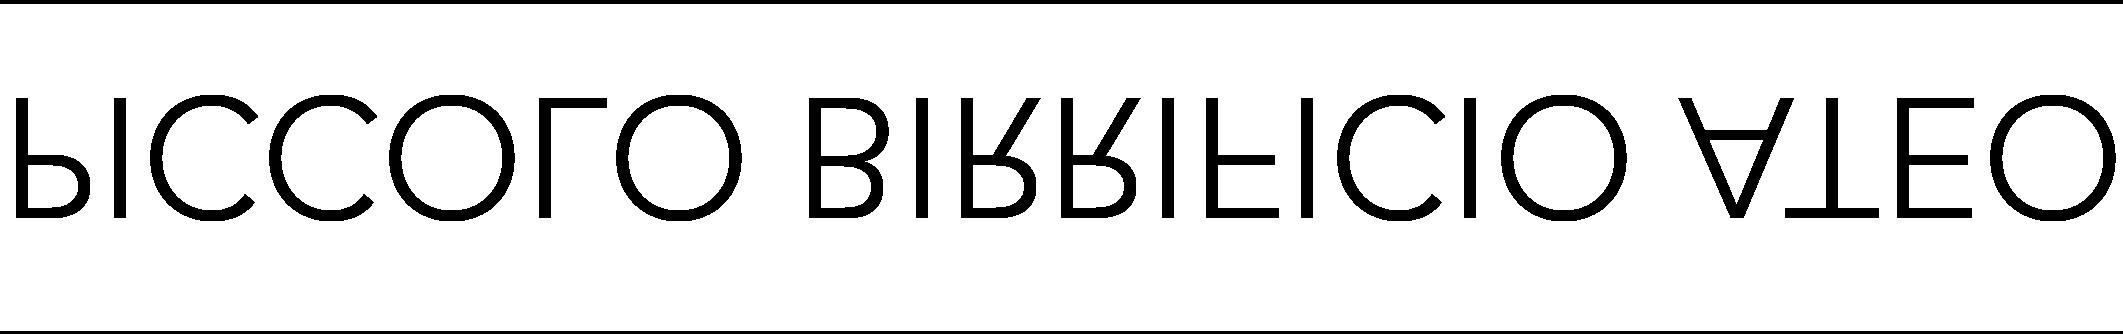 pba-600x300